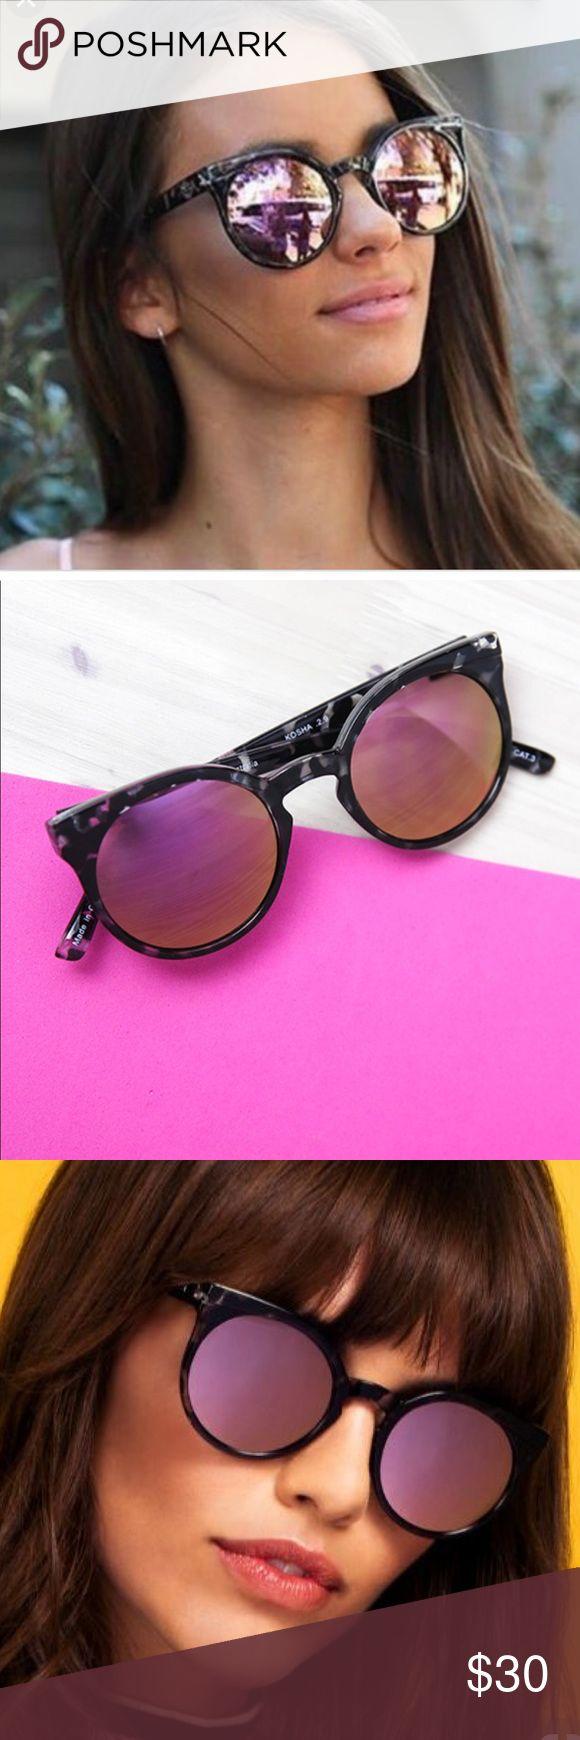 Quay black tortoise pink mirror glasses Still in great condition! Minor scrapes that are unnoticeable - like new💋 Quay Australia Accessories Sunglasses